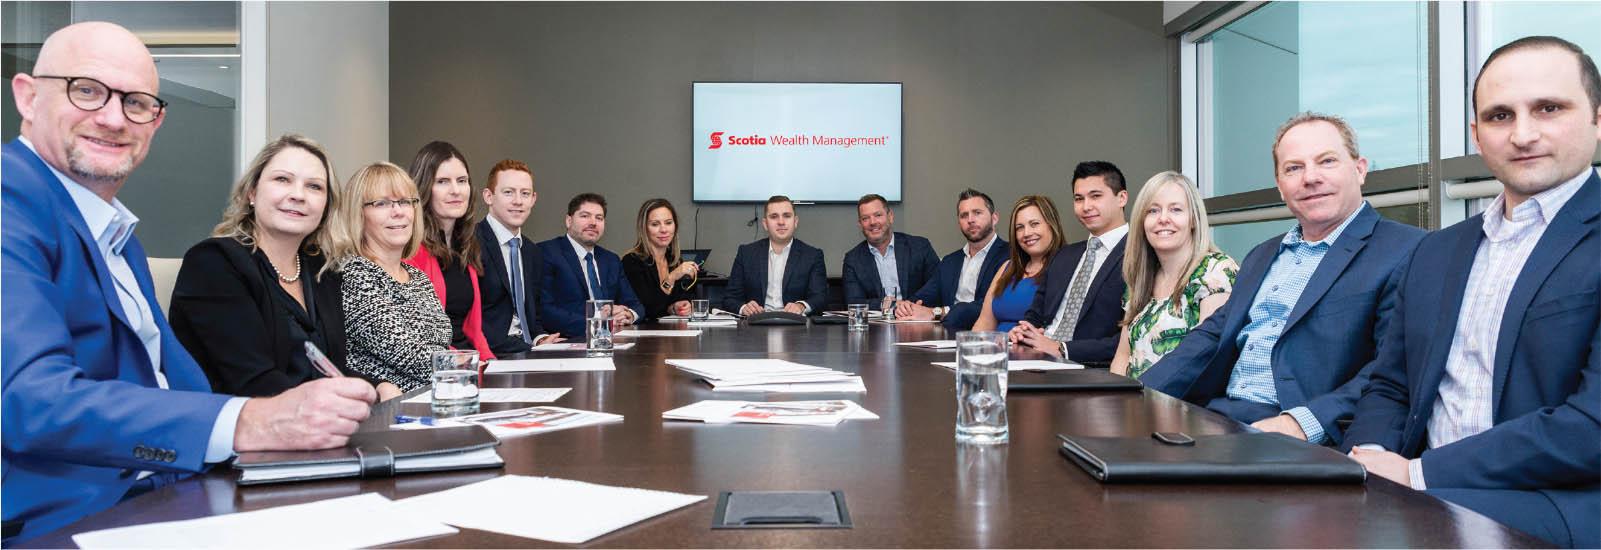 The Burlington Scotia Wealth Management team - MarQuee Magazine Special Feature